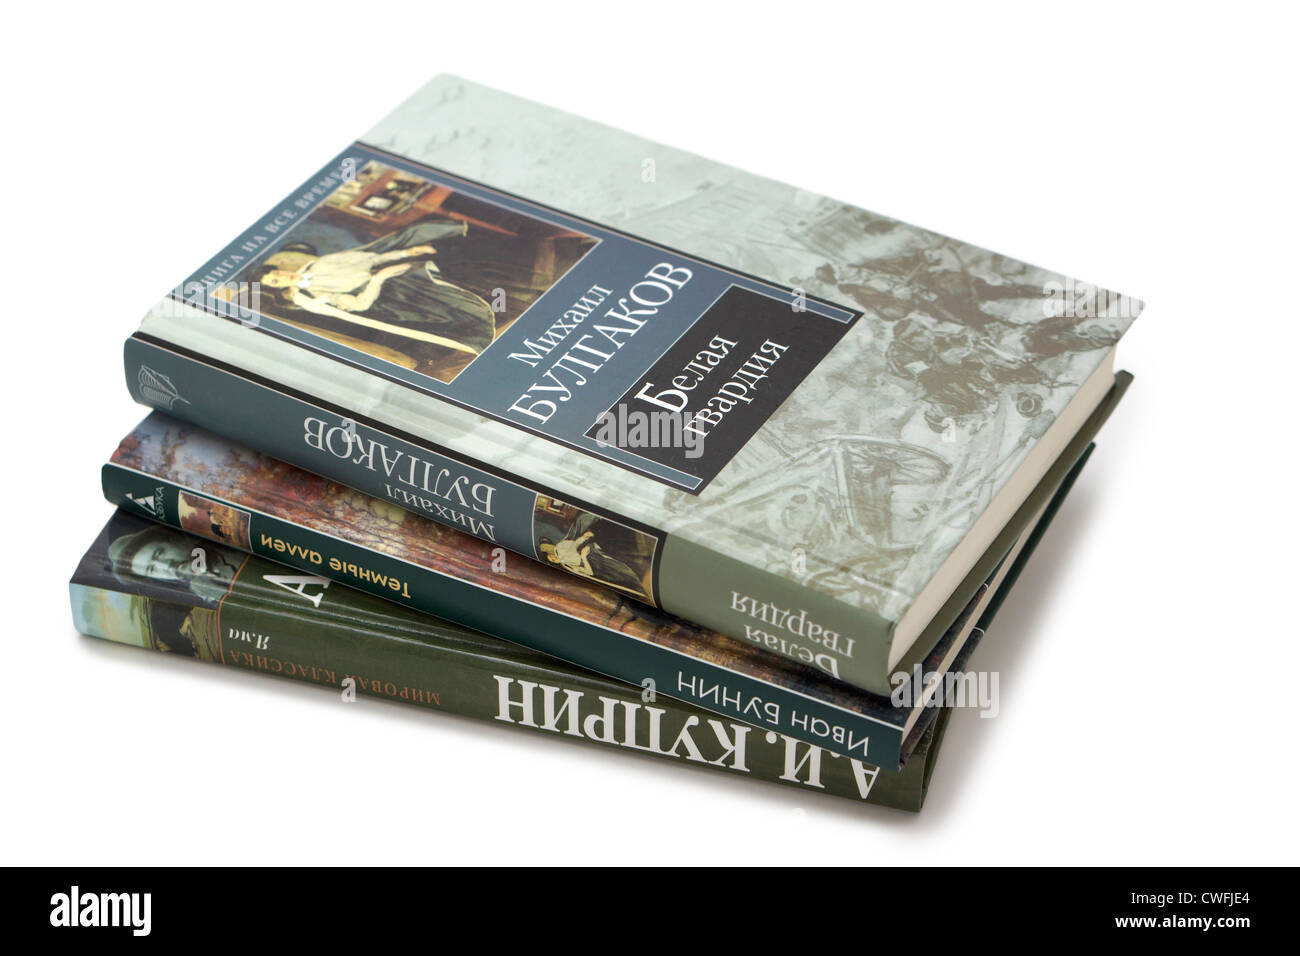 Russian Books - Stock Image